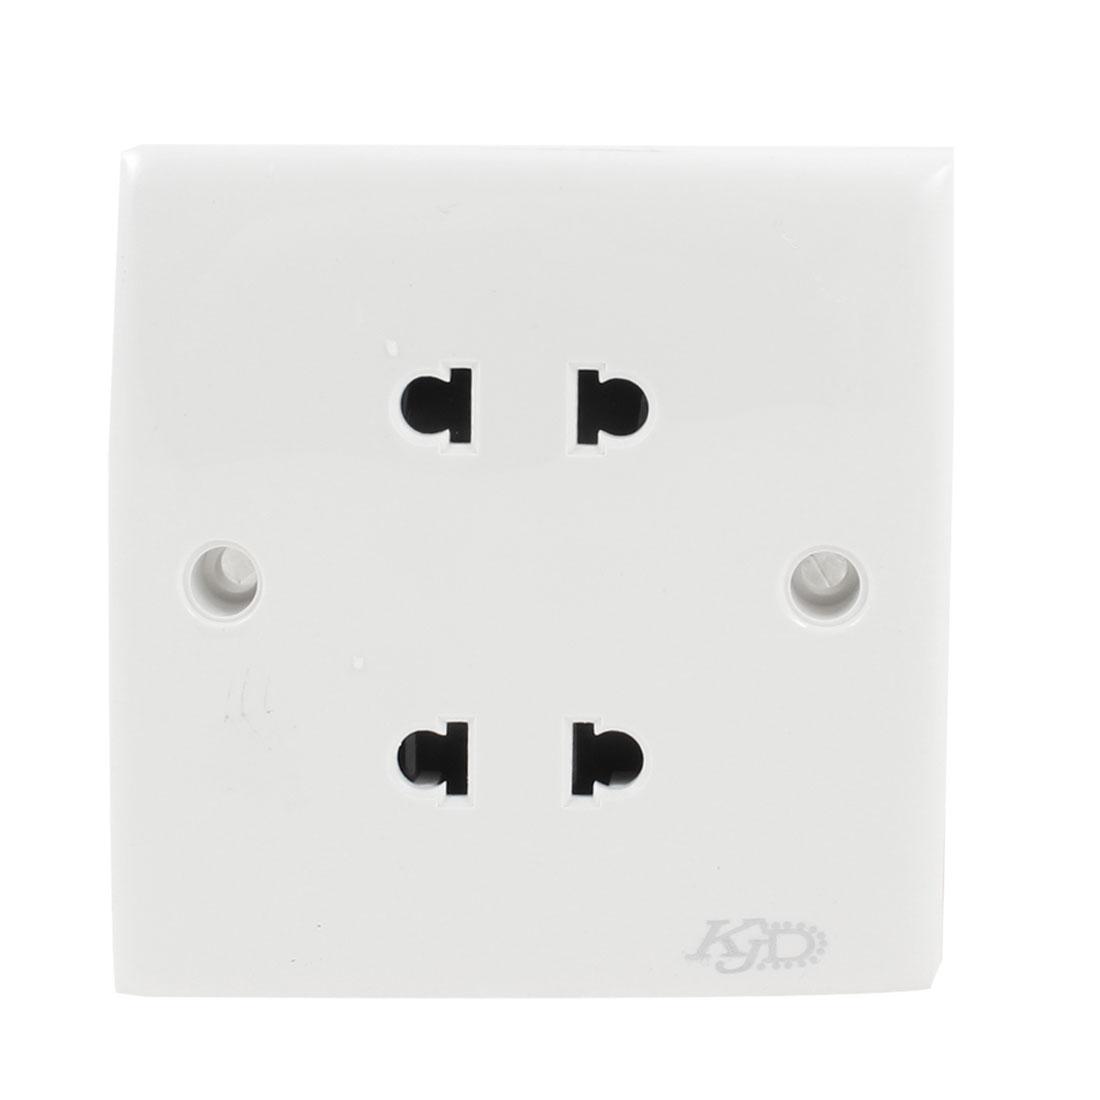 Household Plastic Shell 2 Pin US EU Socket Wall Plate White AC 250V 10A